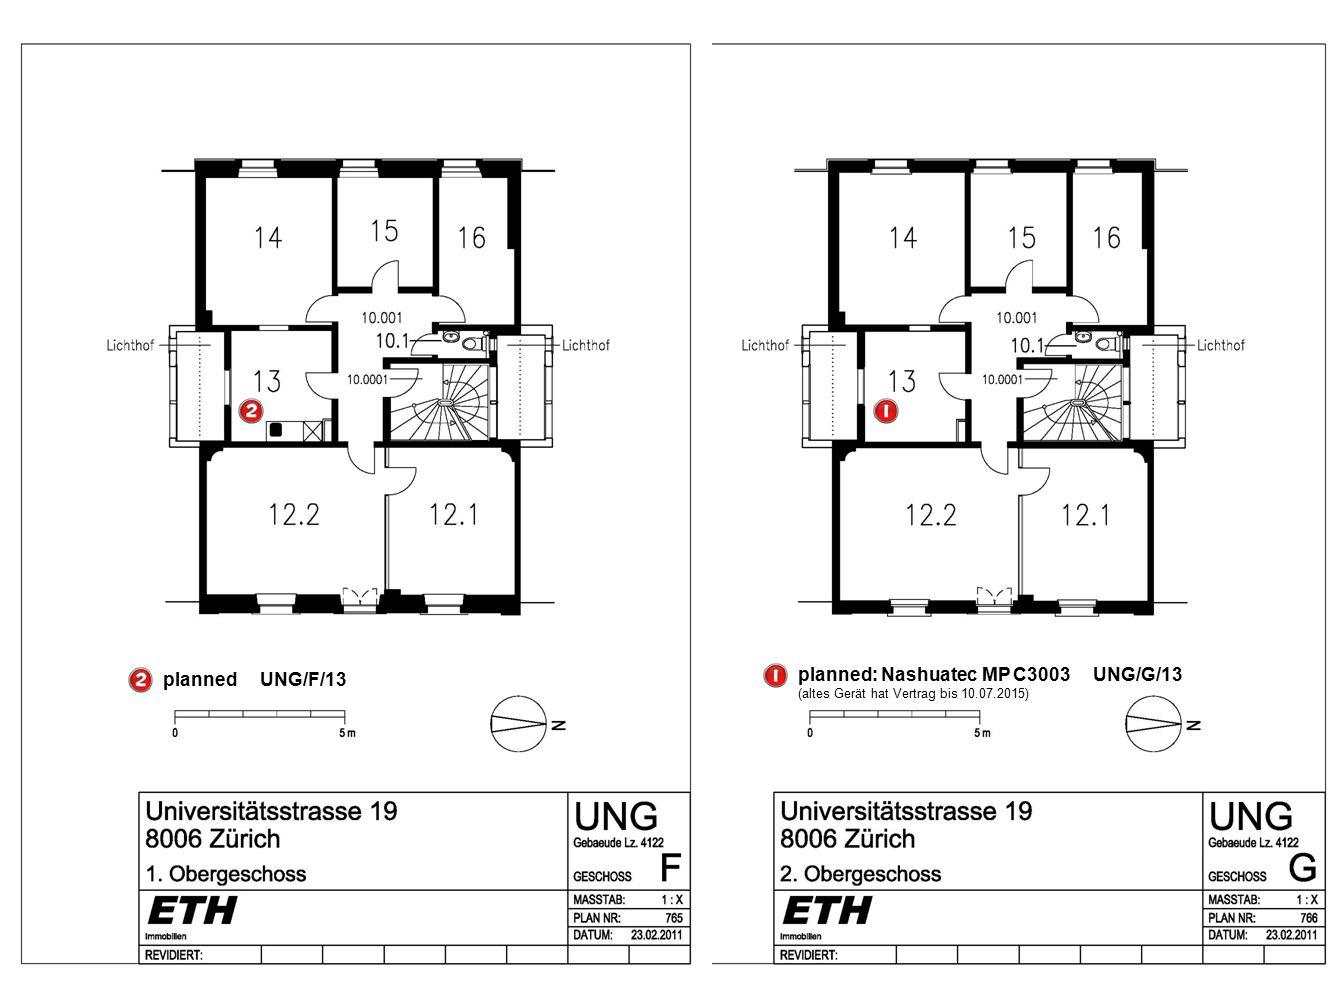 planned: Nashuatec MP C3003 UNG/G/13 (altes Gerät hat Vertrag bis 10.07.2015) planned UNG/F/13